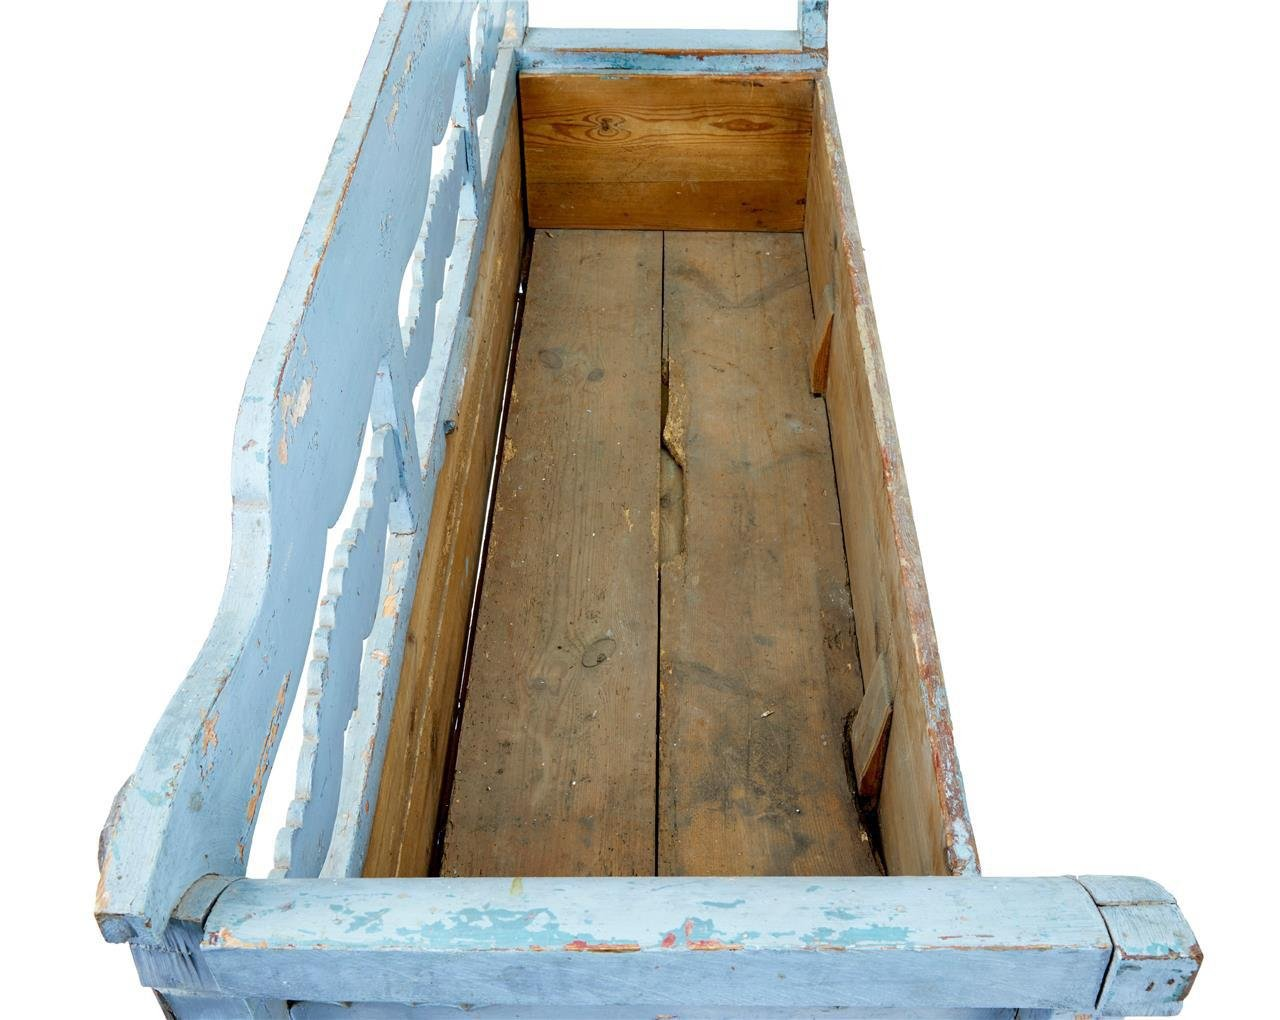 gro e antike bank aus kiefernholz mit stauraum bei pamono. Black Bedroom Furniture Sets. Home Design Ideas